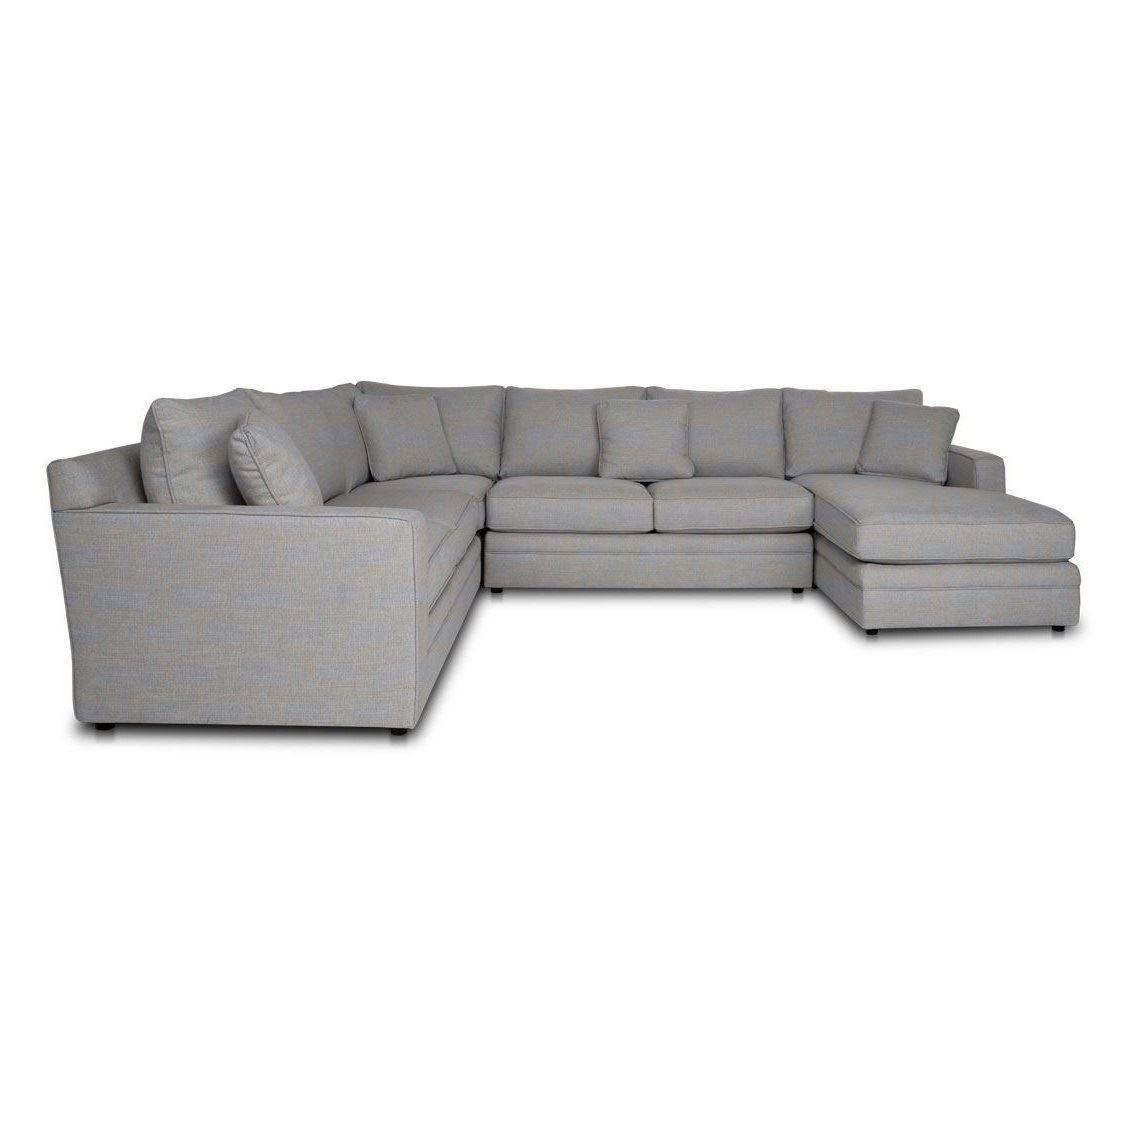 Andersen 6 Seat Fabric Corner Modular Sofa W Right Chaise Size W 358cm X D 277cm X H 100cm In Cloud Fabric Foam Fibre Freedom Modular Sofa Sofa Cloud Fabric